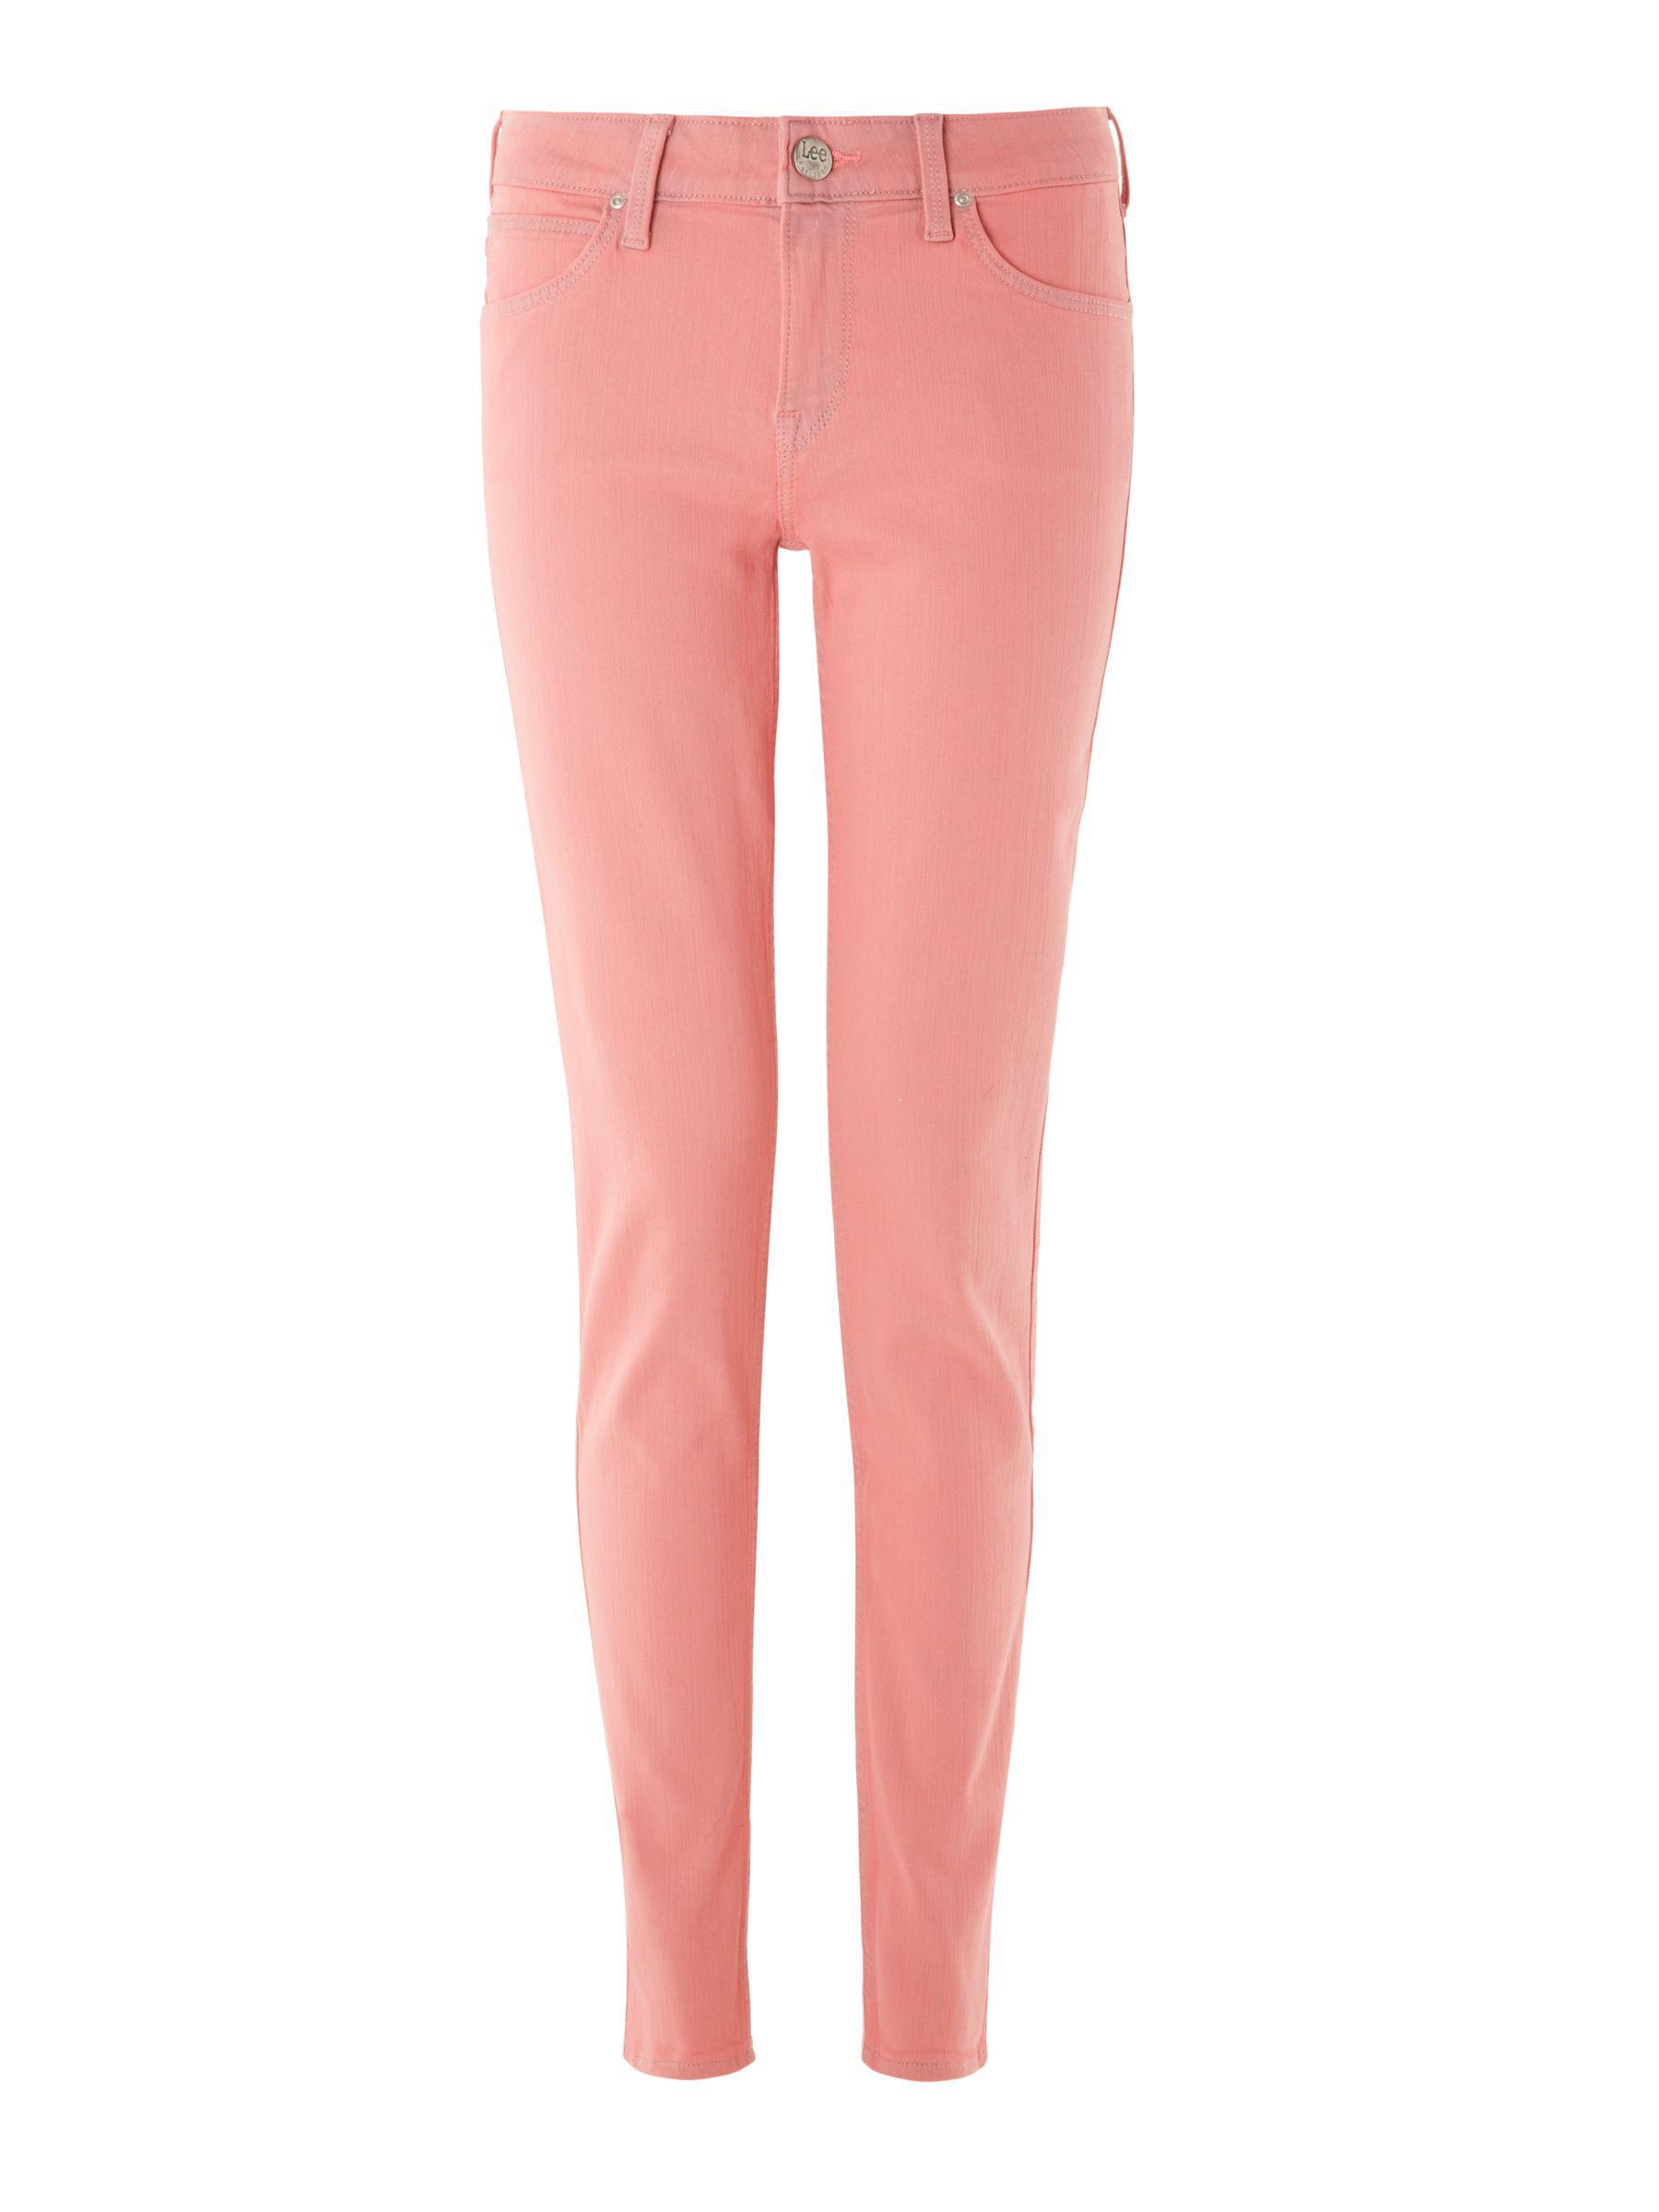 Lee Jeans Denim Scarlett Regular Waist Skinny Jeans in Pastel Pink (Pink)